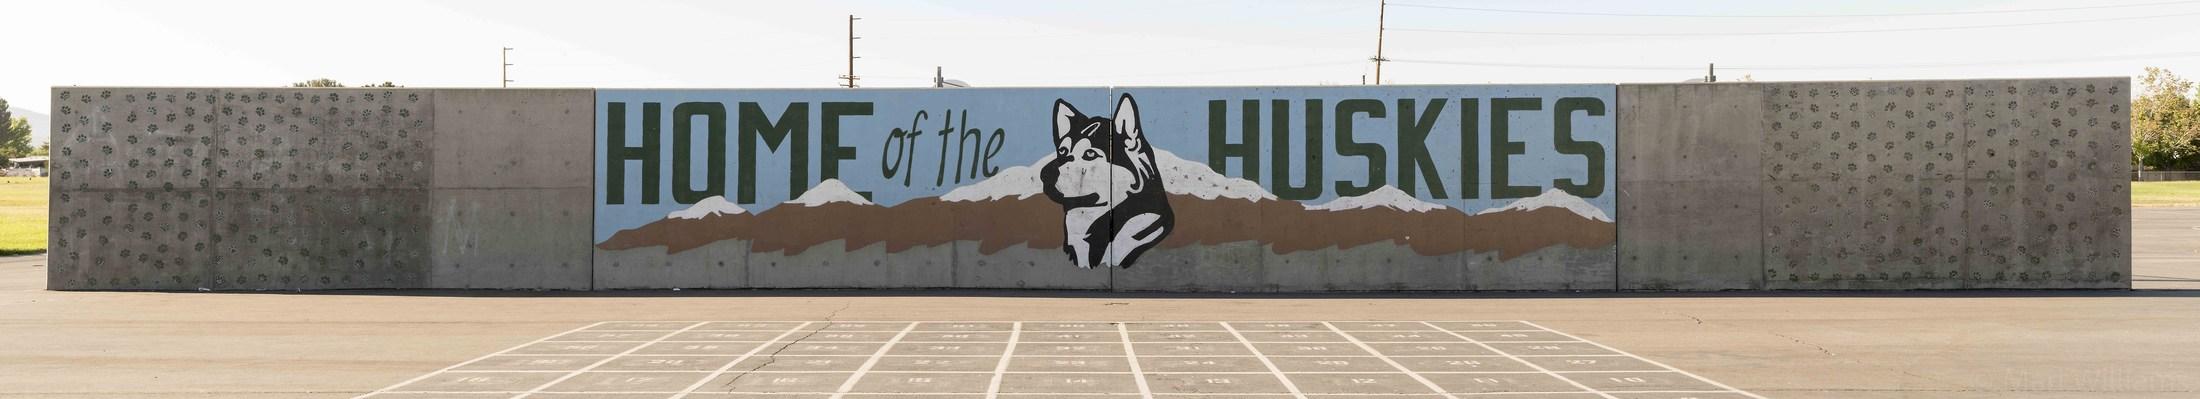 Home of the Huskies Mural